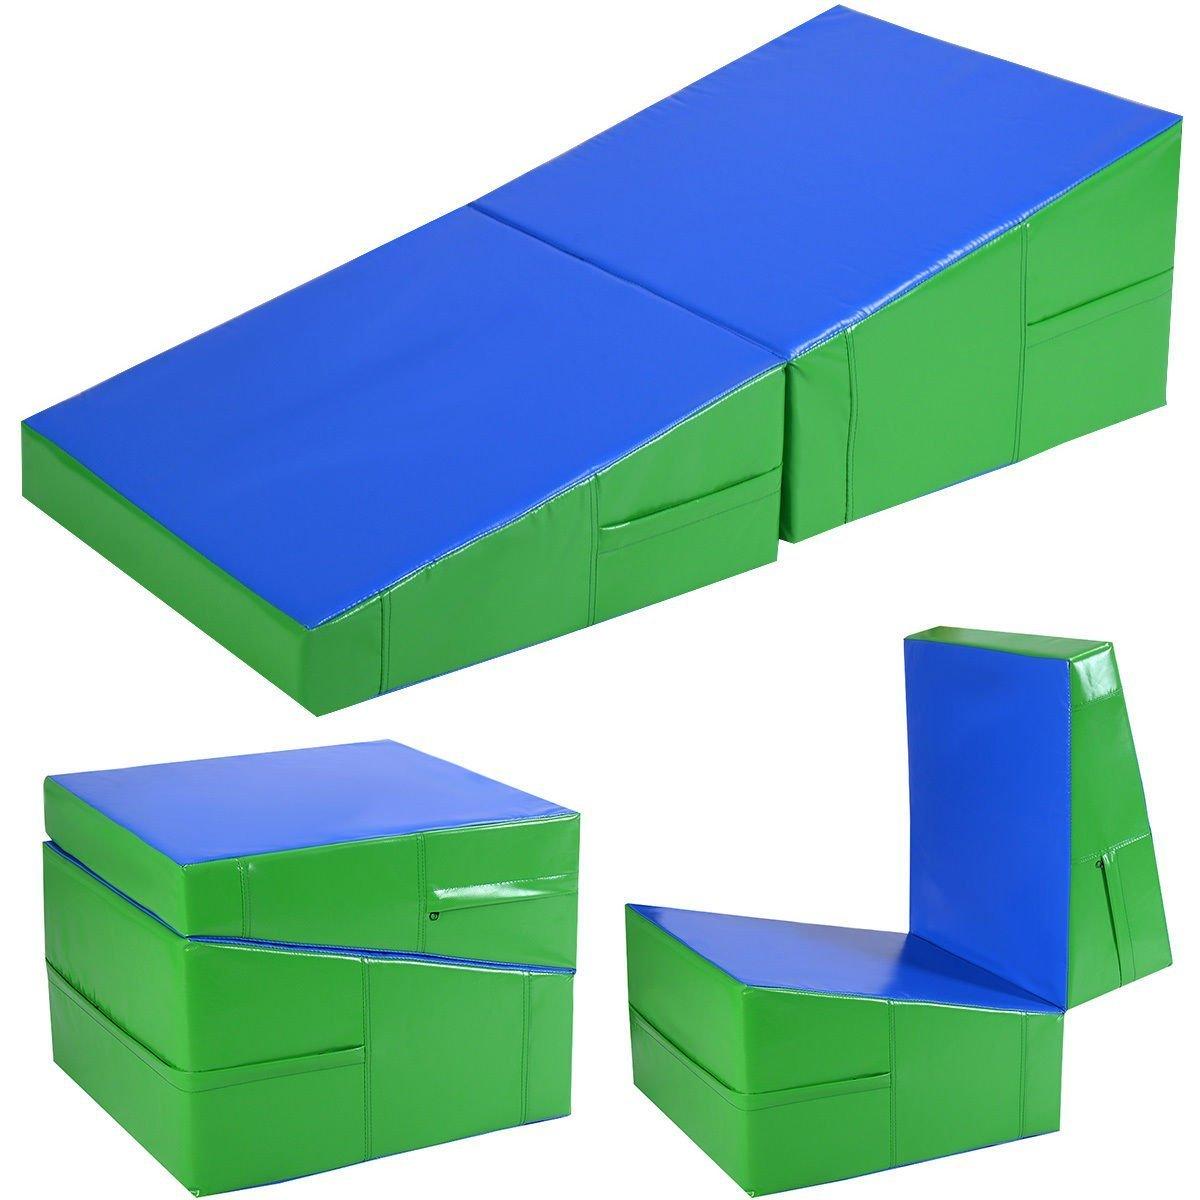 ramp large gymnastics folding home triangle kids dp gymmatsdirect aerobics mats skill incline for play mat exercise amazon tumbling shape com wedge cheese